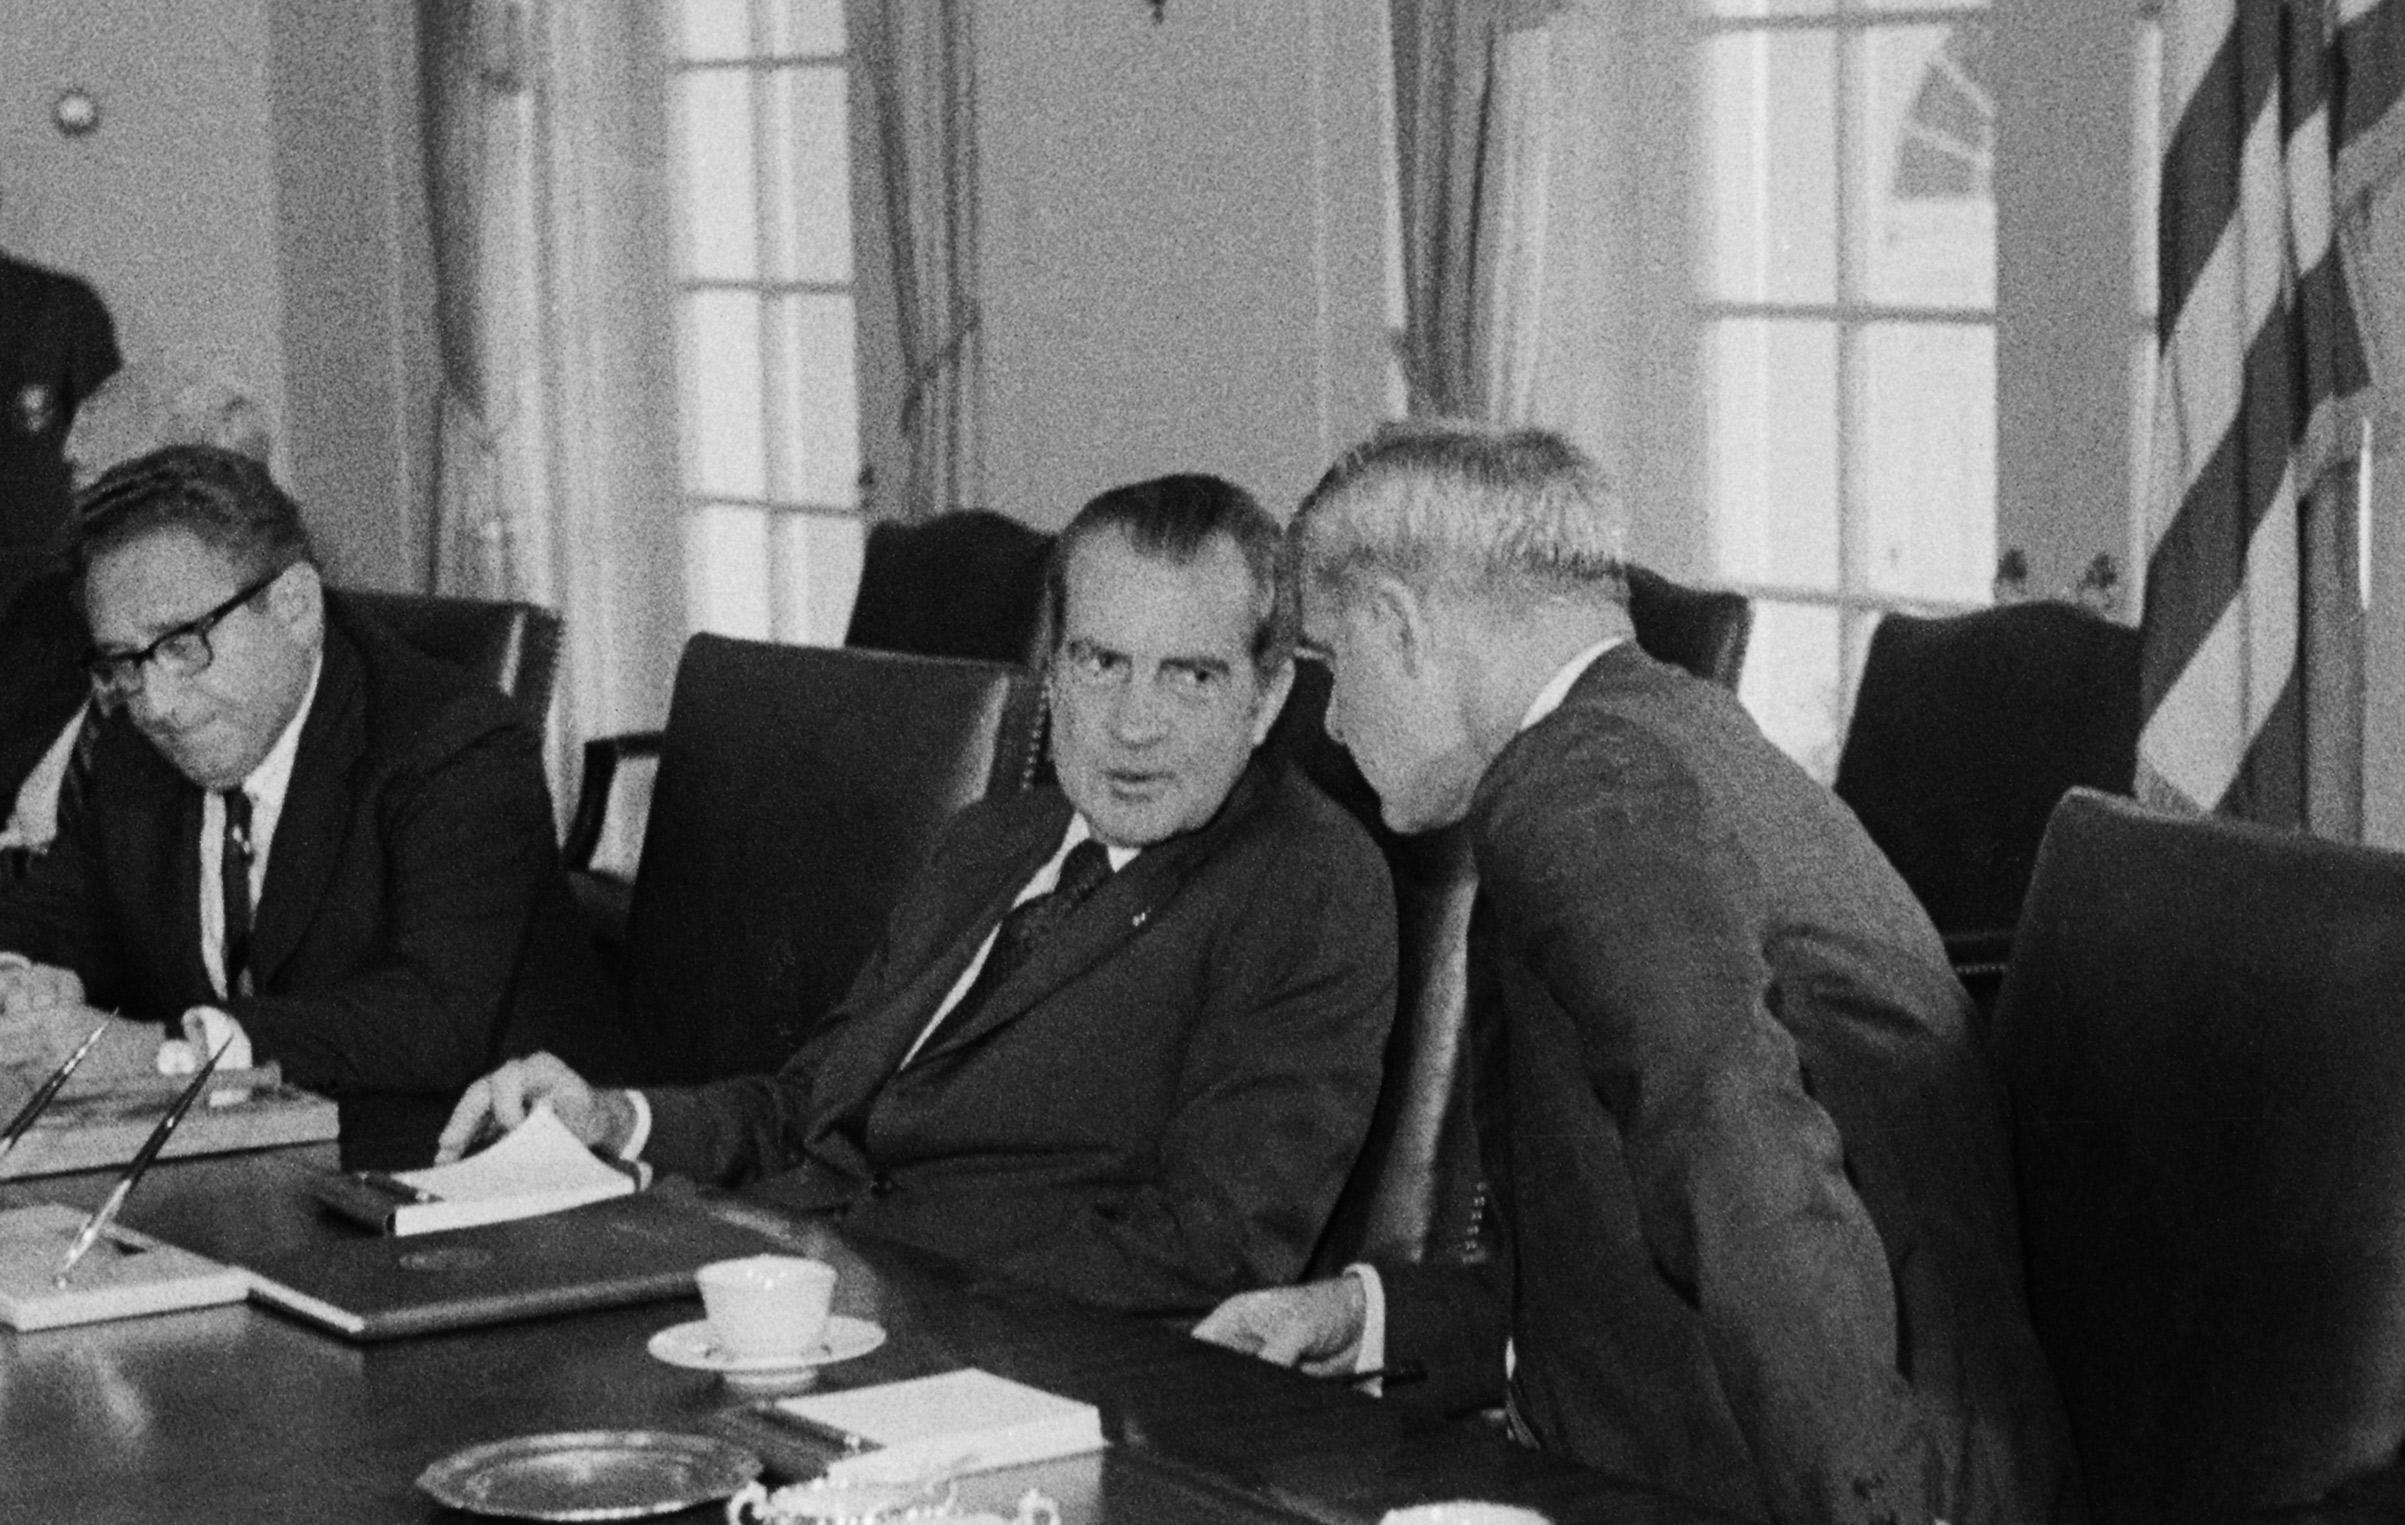 Nixon flanked by Secretary of State Henry Kissinger (left) and Secretary of Defense James Schlesinger at the White House on Aug. 6, 1974.